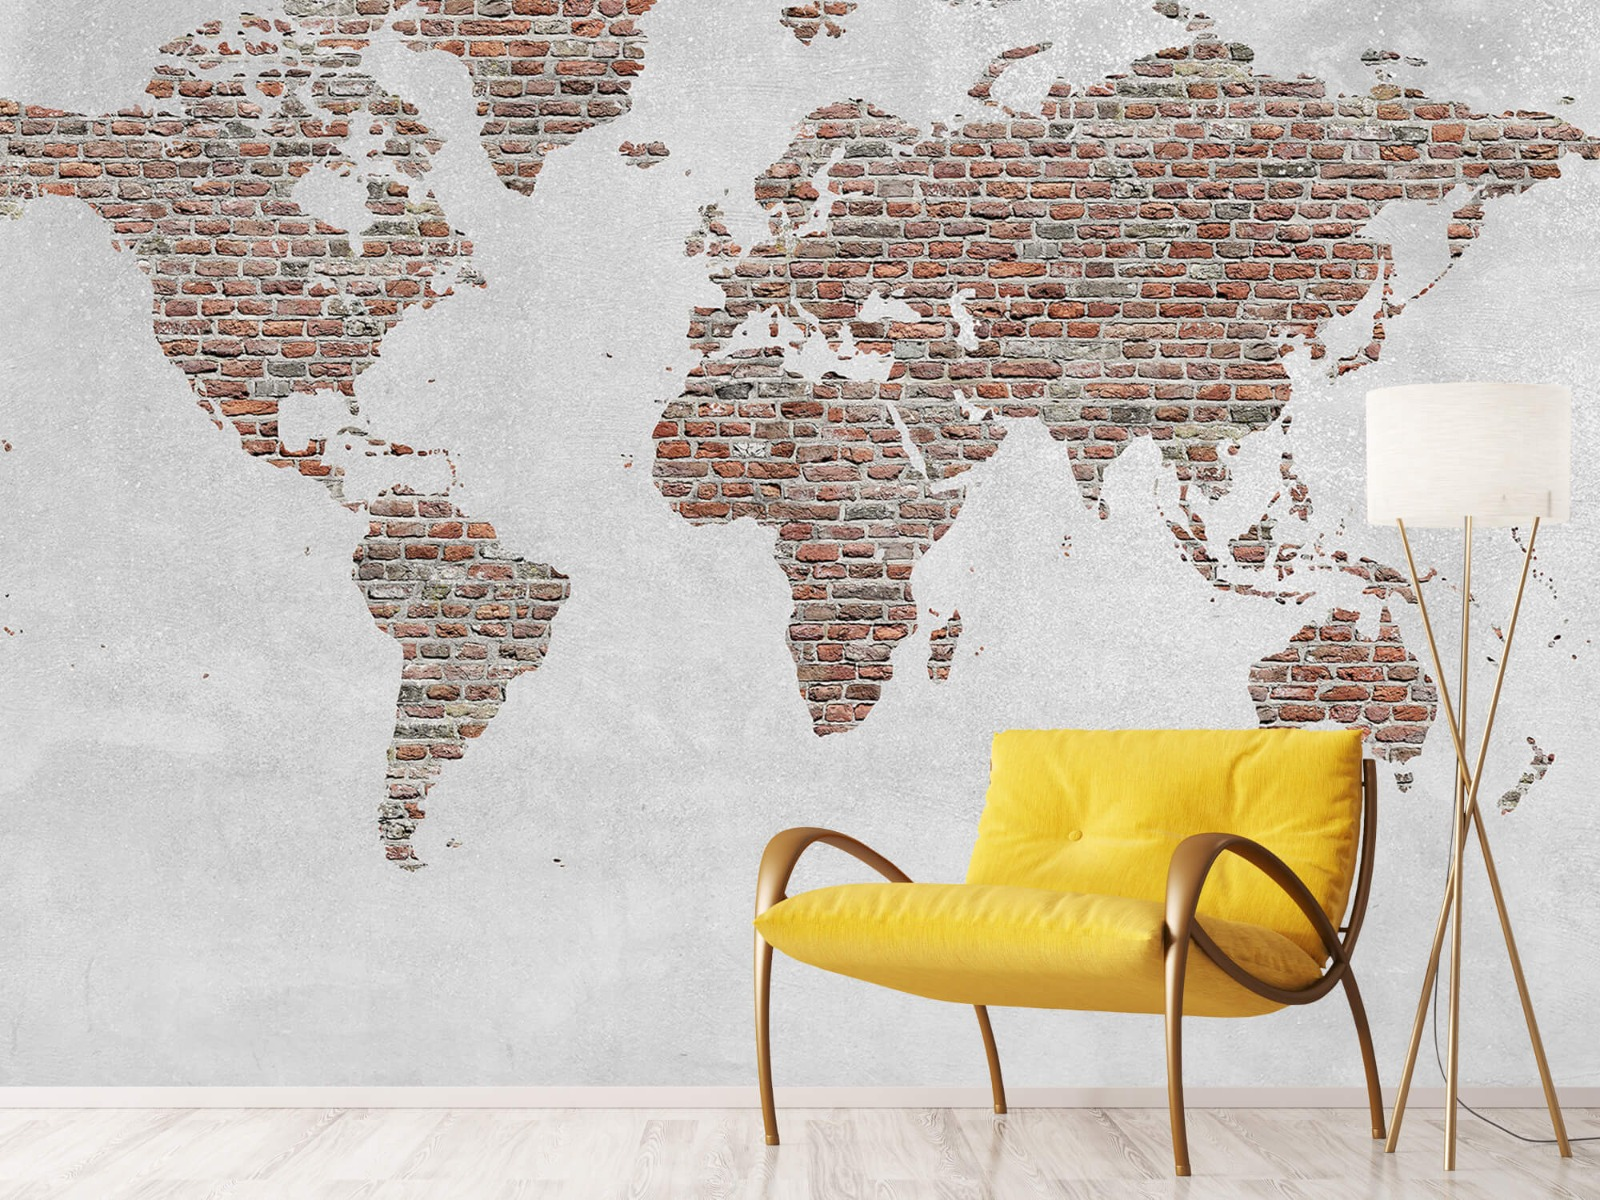 Steen behang - Wereldkaart stenen - Slaapkamer 10